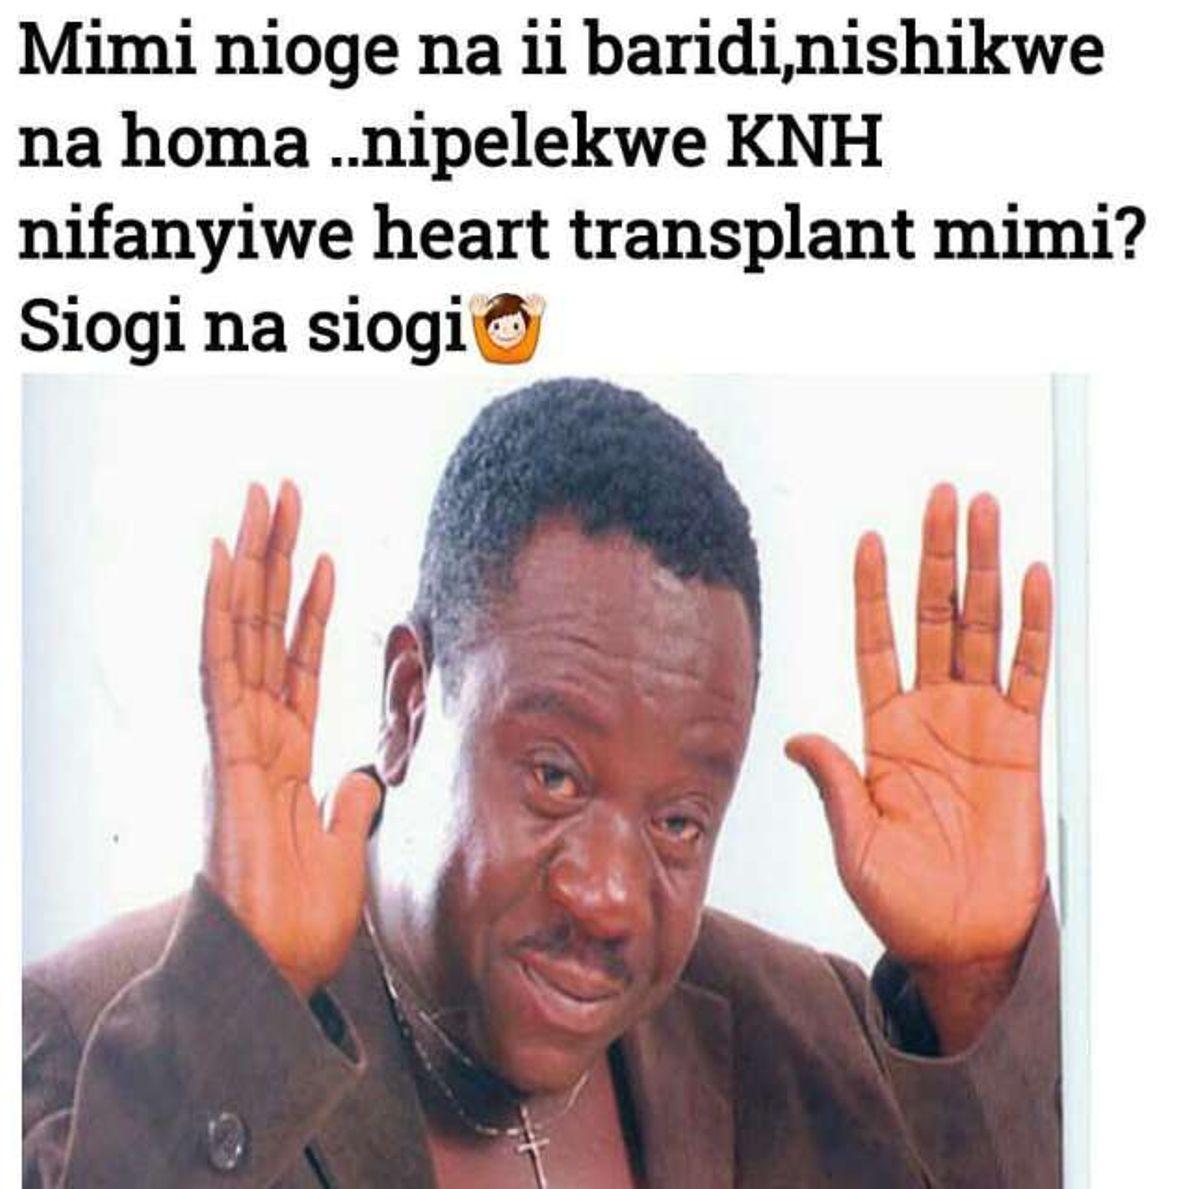 memes hilarious rainy nairobi season cold kenyan kenya funny